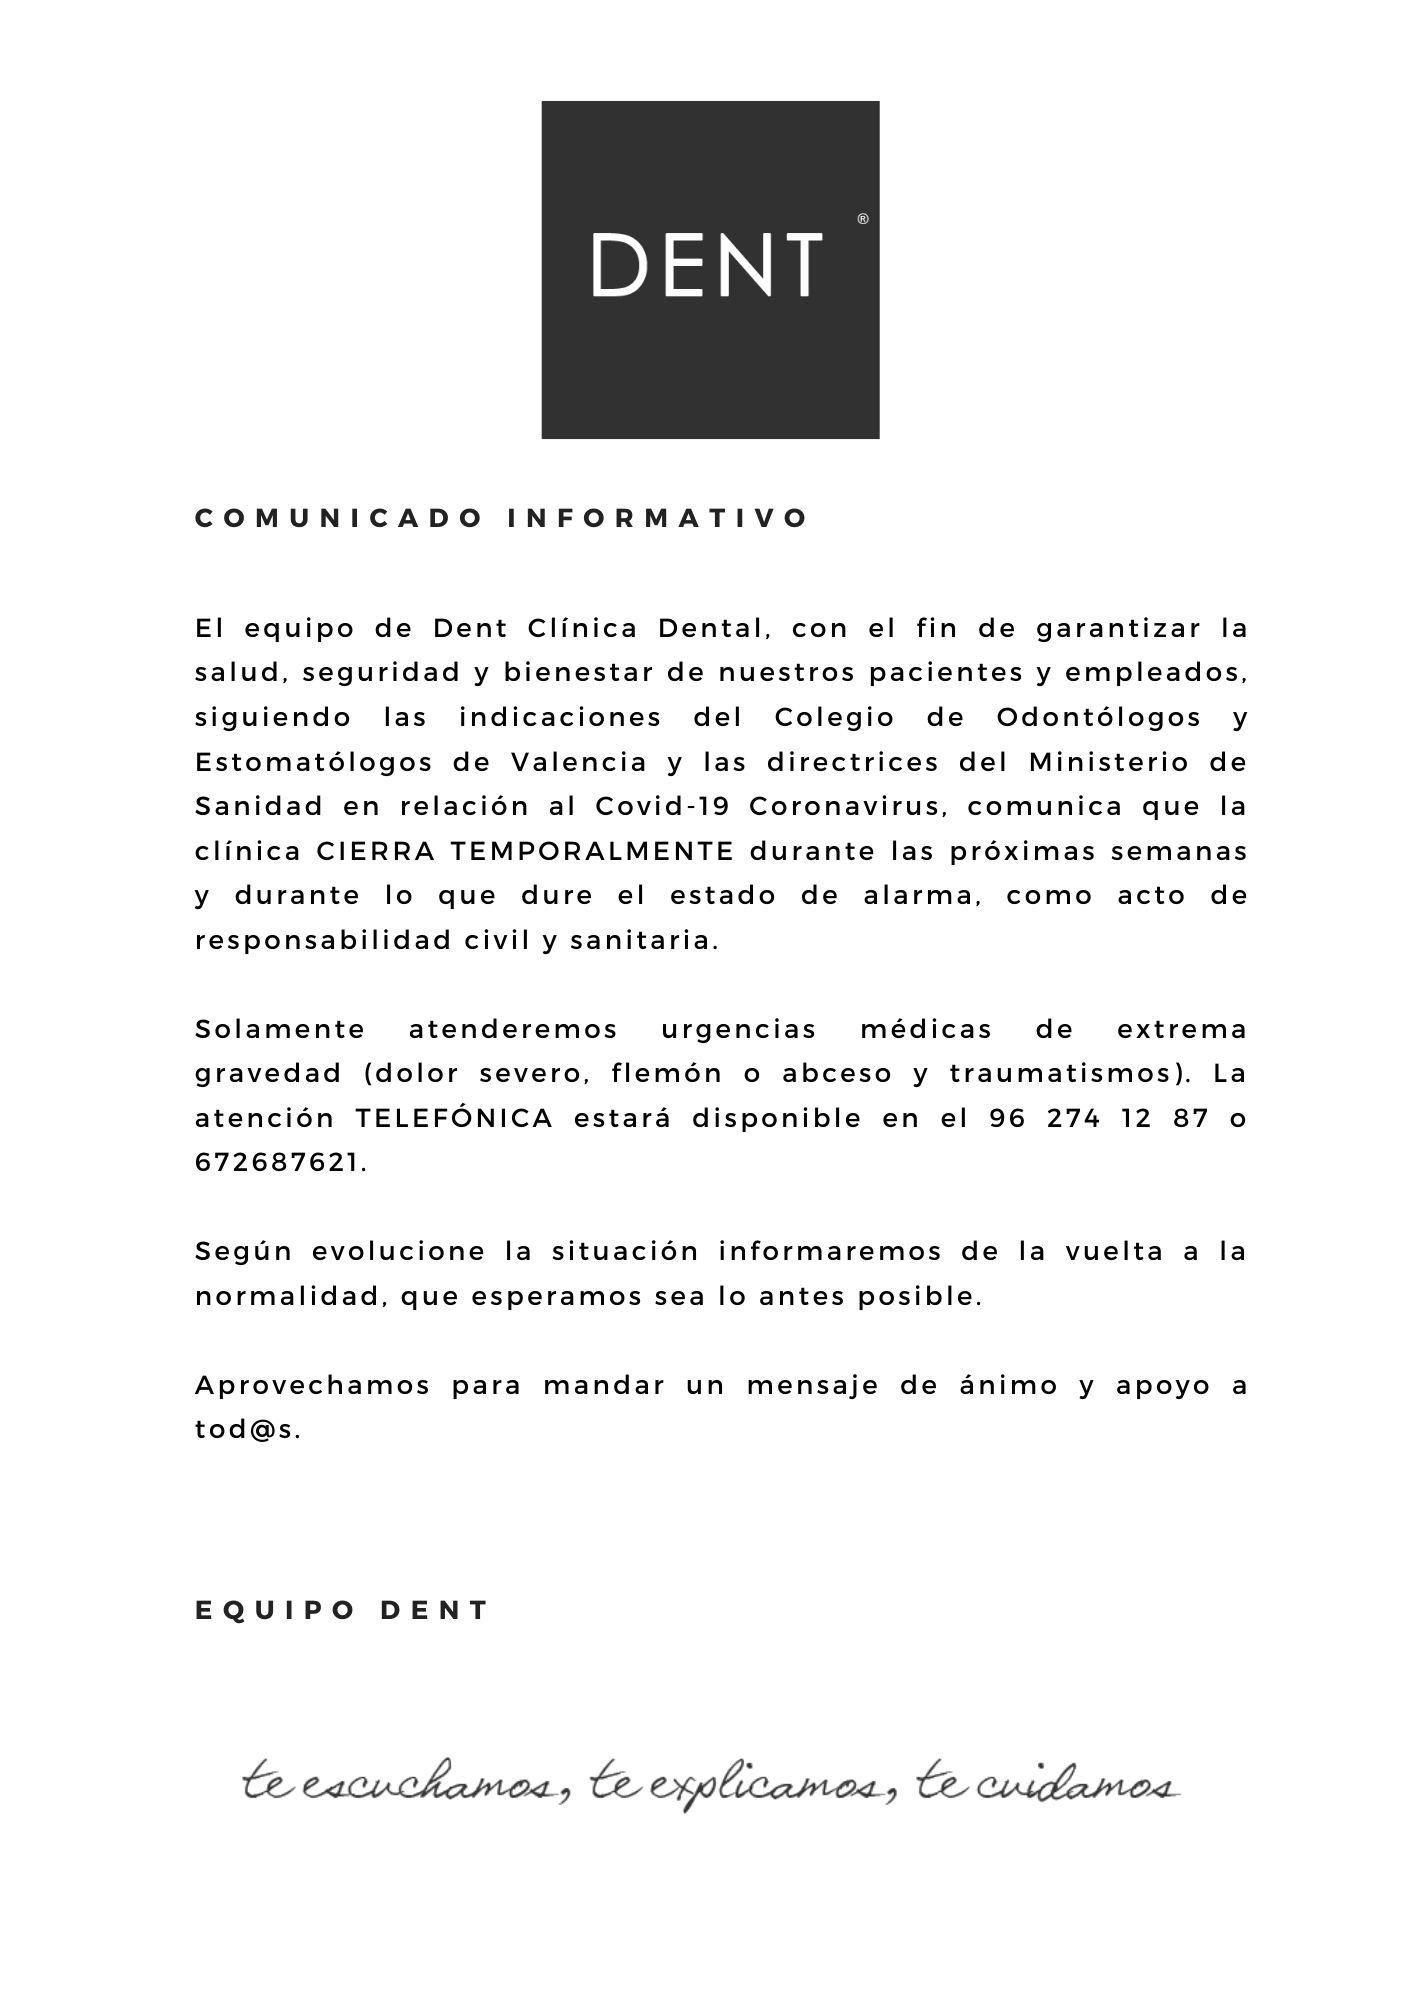 COMUNICADO IMPORTANTE-2